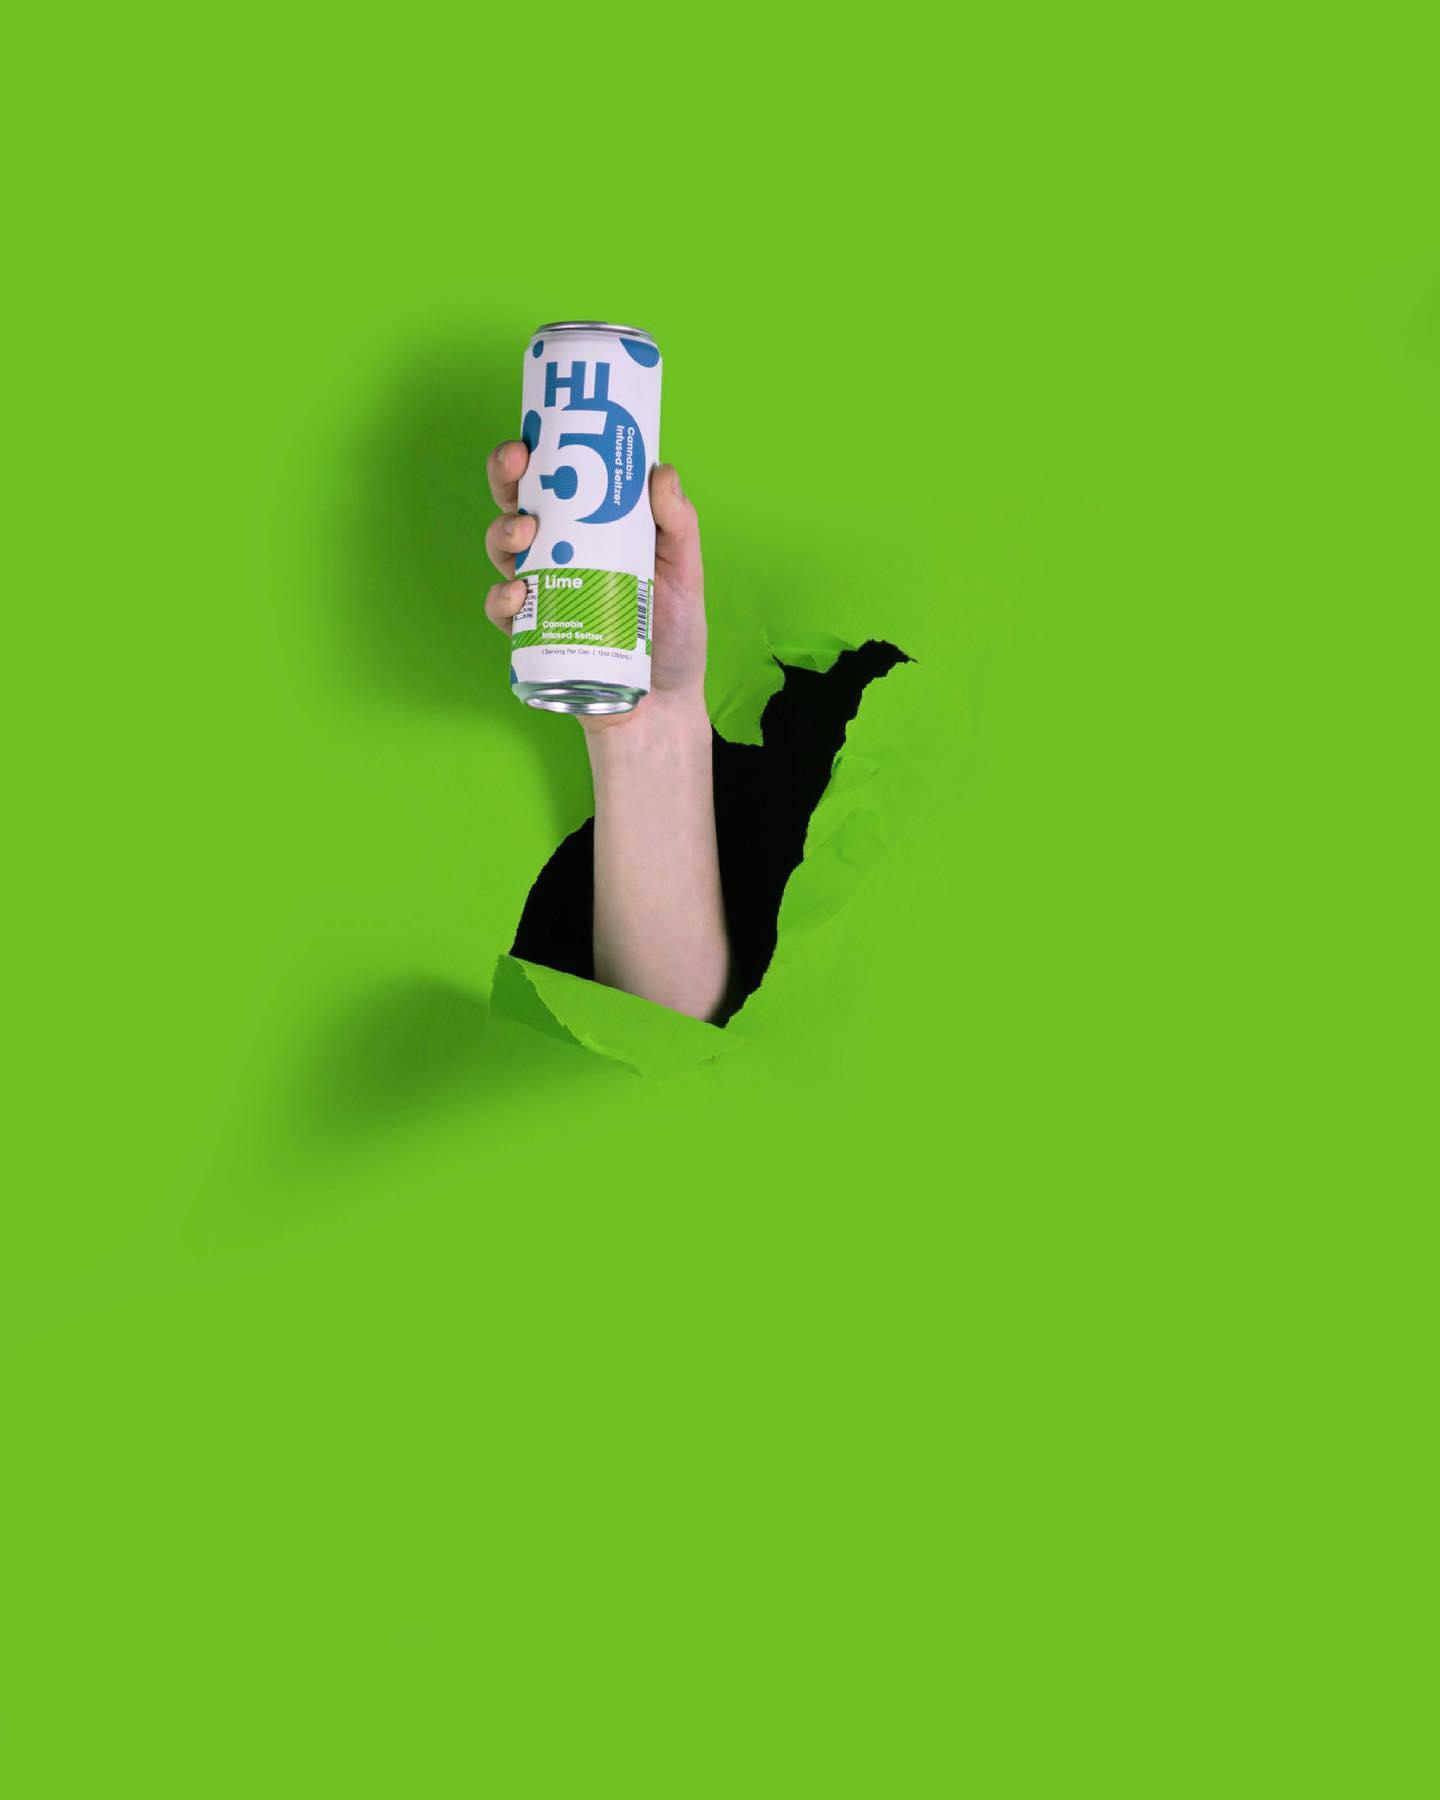 Lime-Hi5-Cannabis-Infused-Seltzer